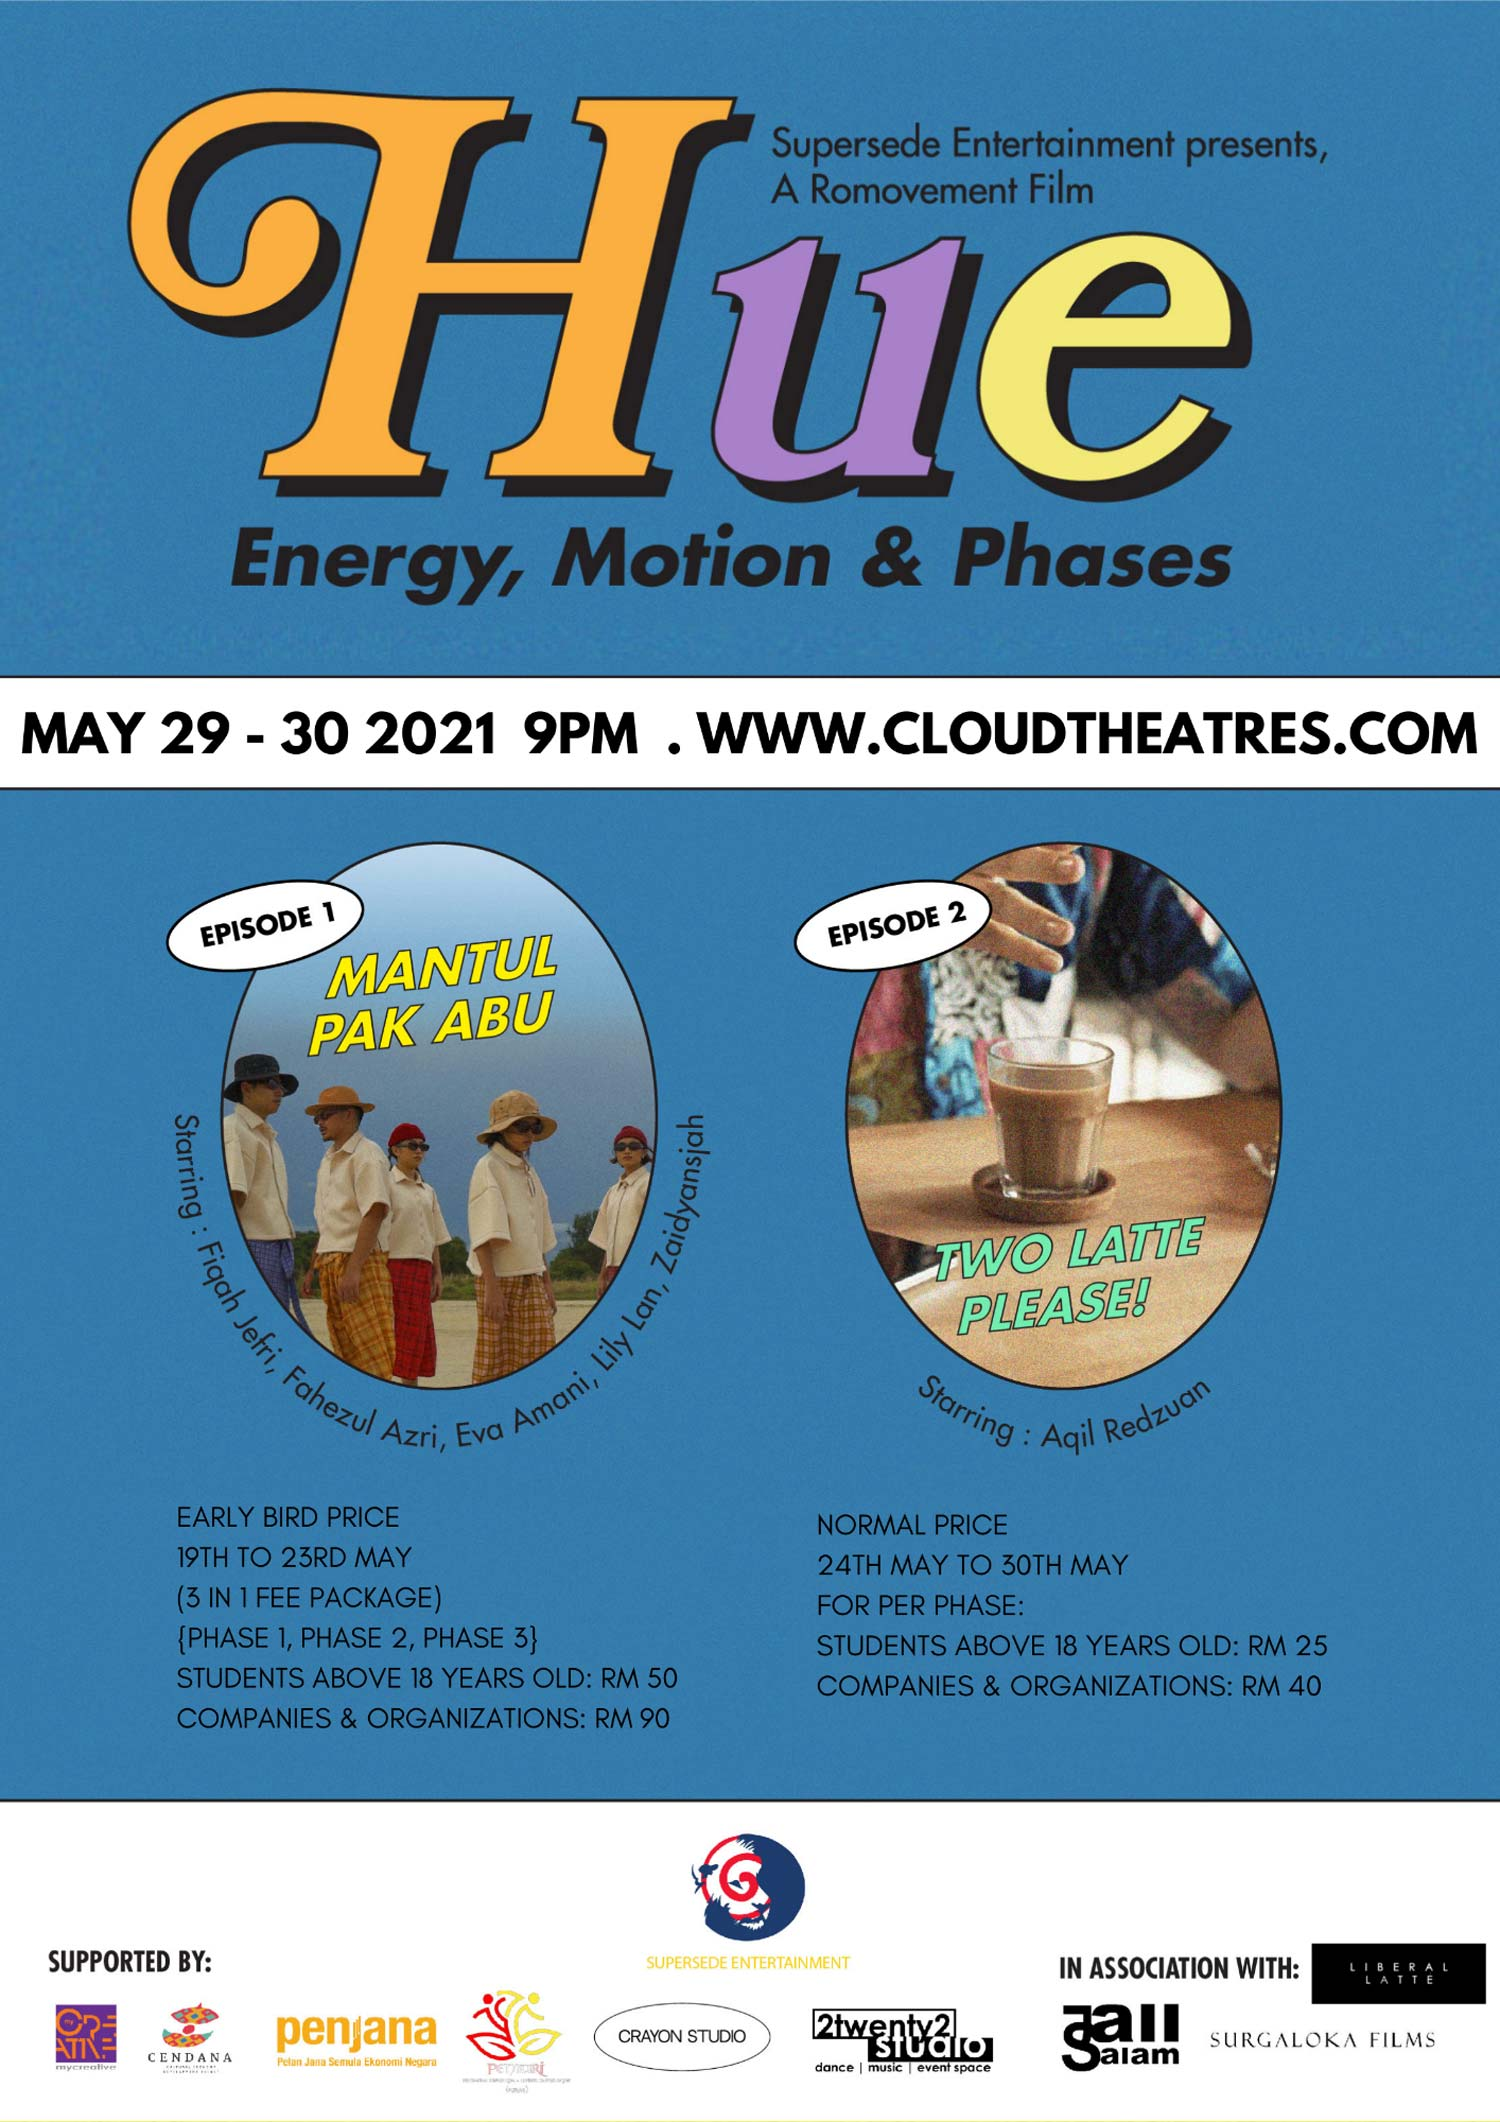 HUE (Phase 1): Energy, Motion & Phases | A Romovement Film